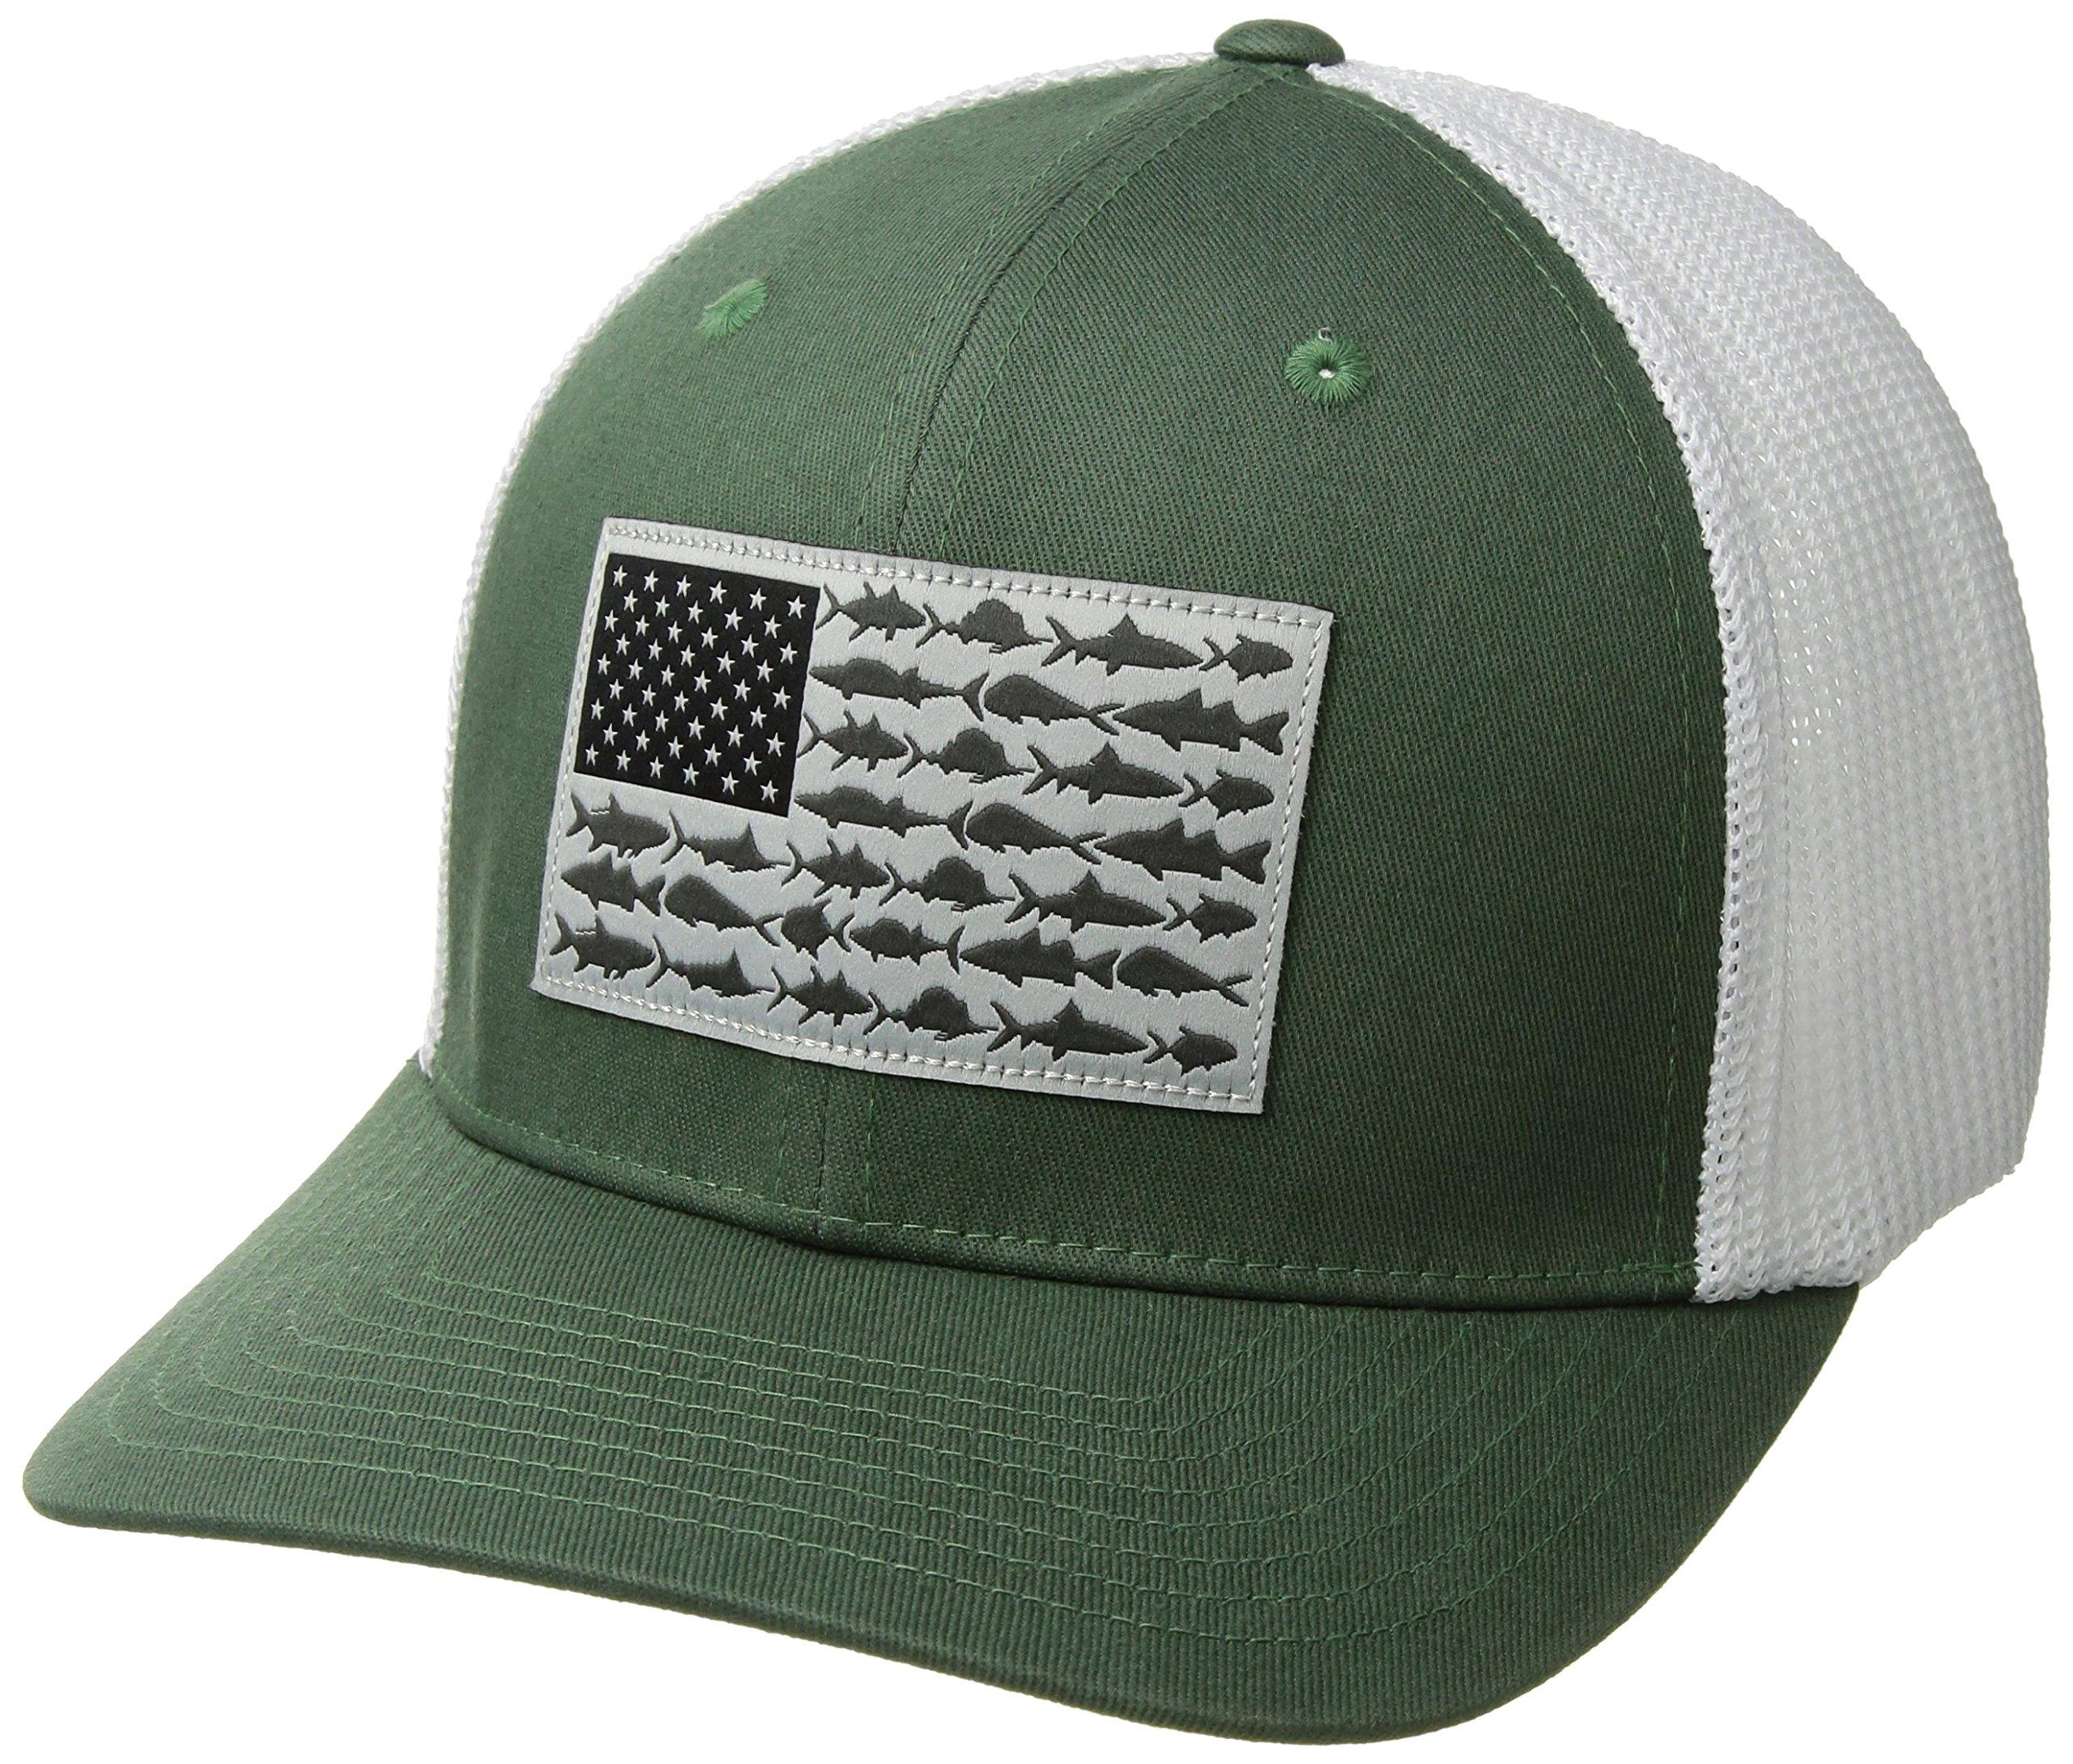 Columbia Unisex Pfg Mesh Ball Cap, Thyme Green, Fish Flag, Large/X-Large